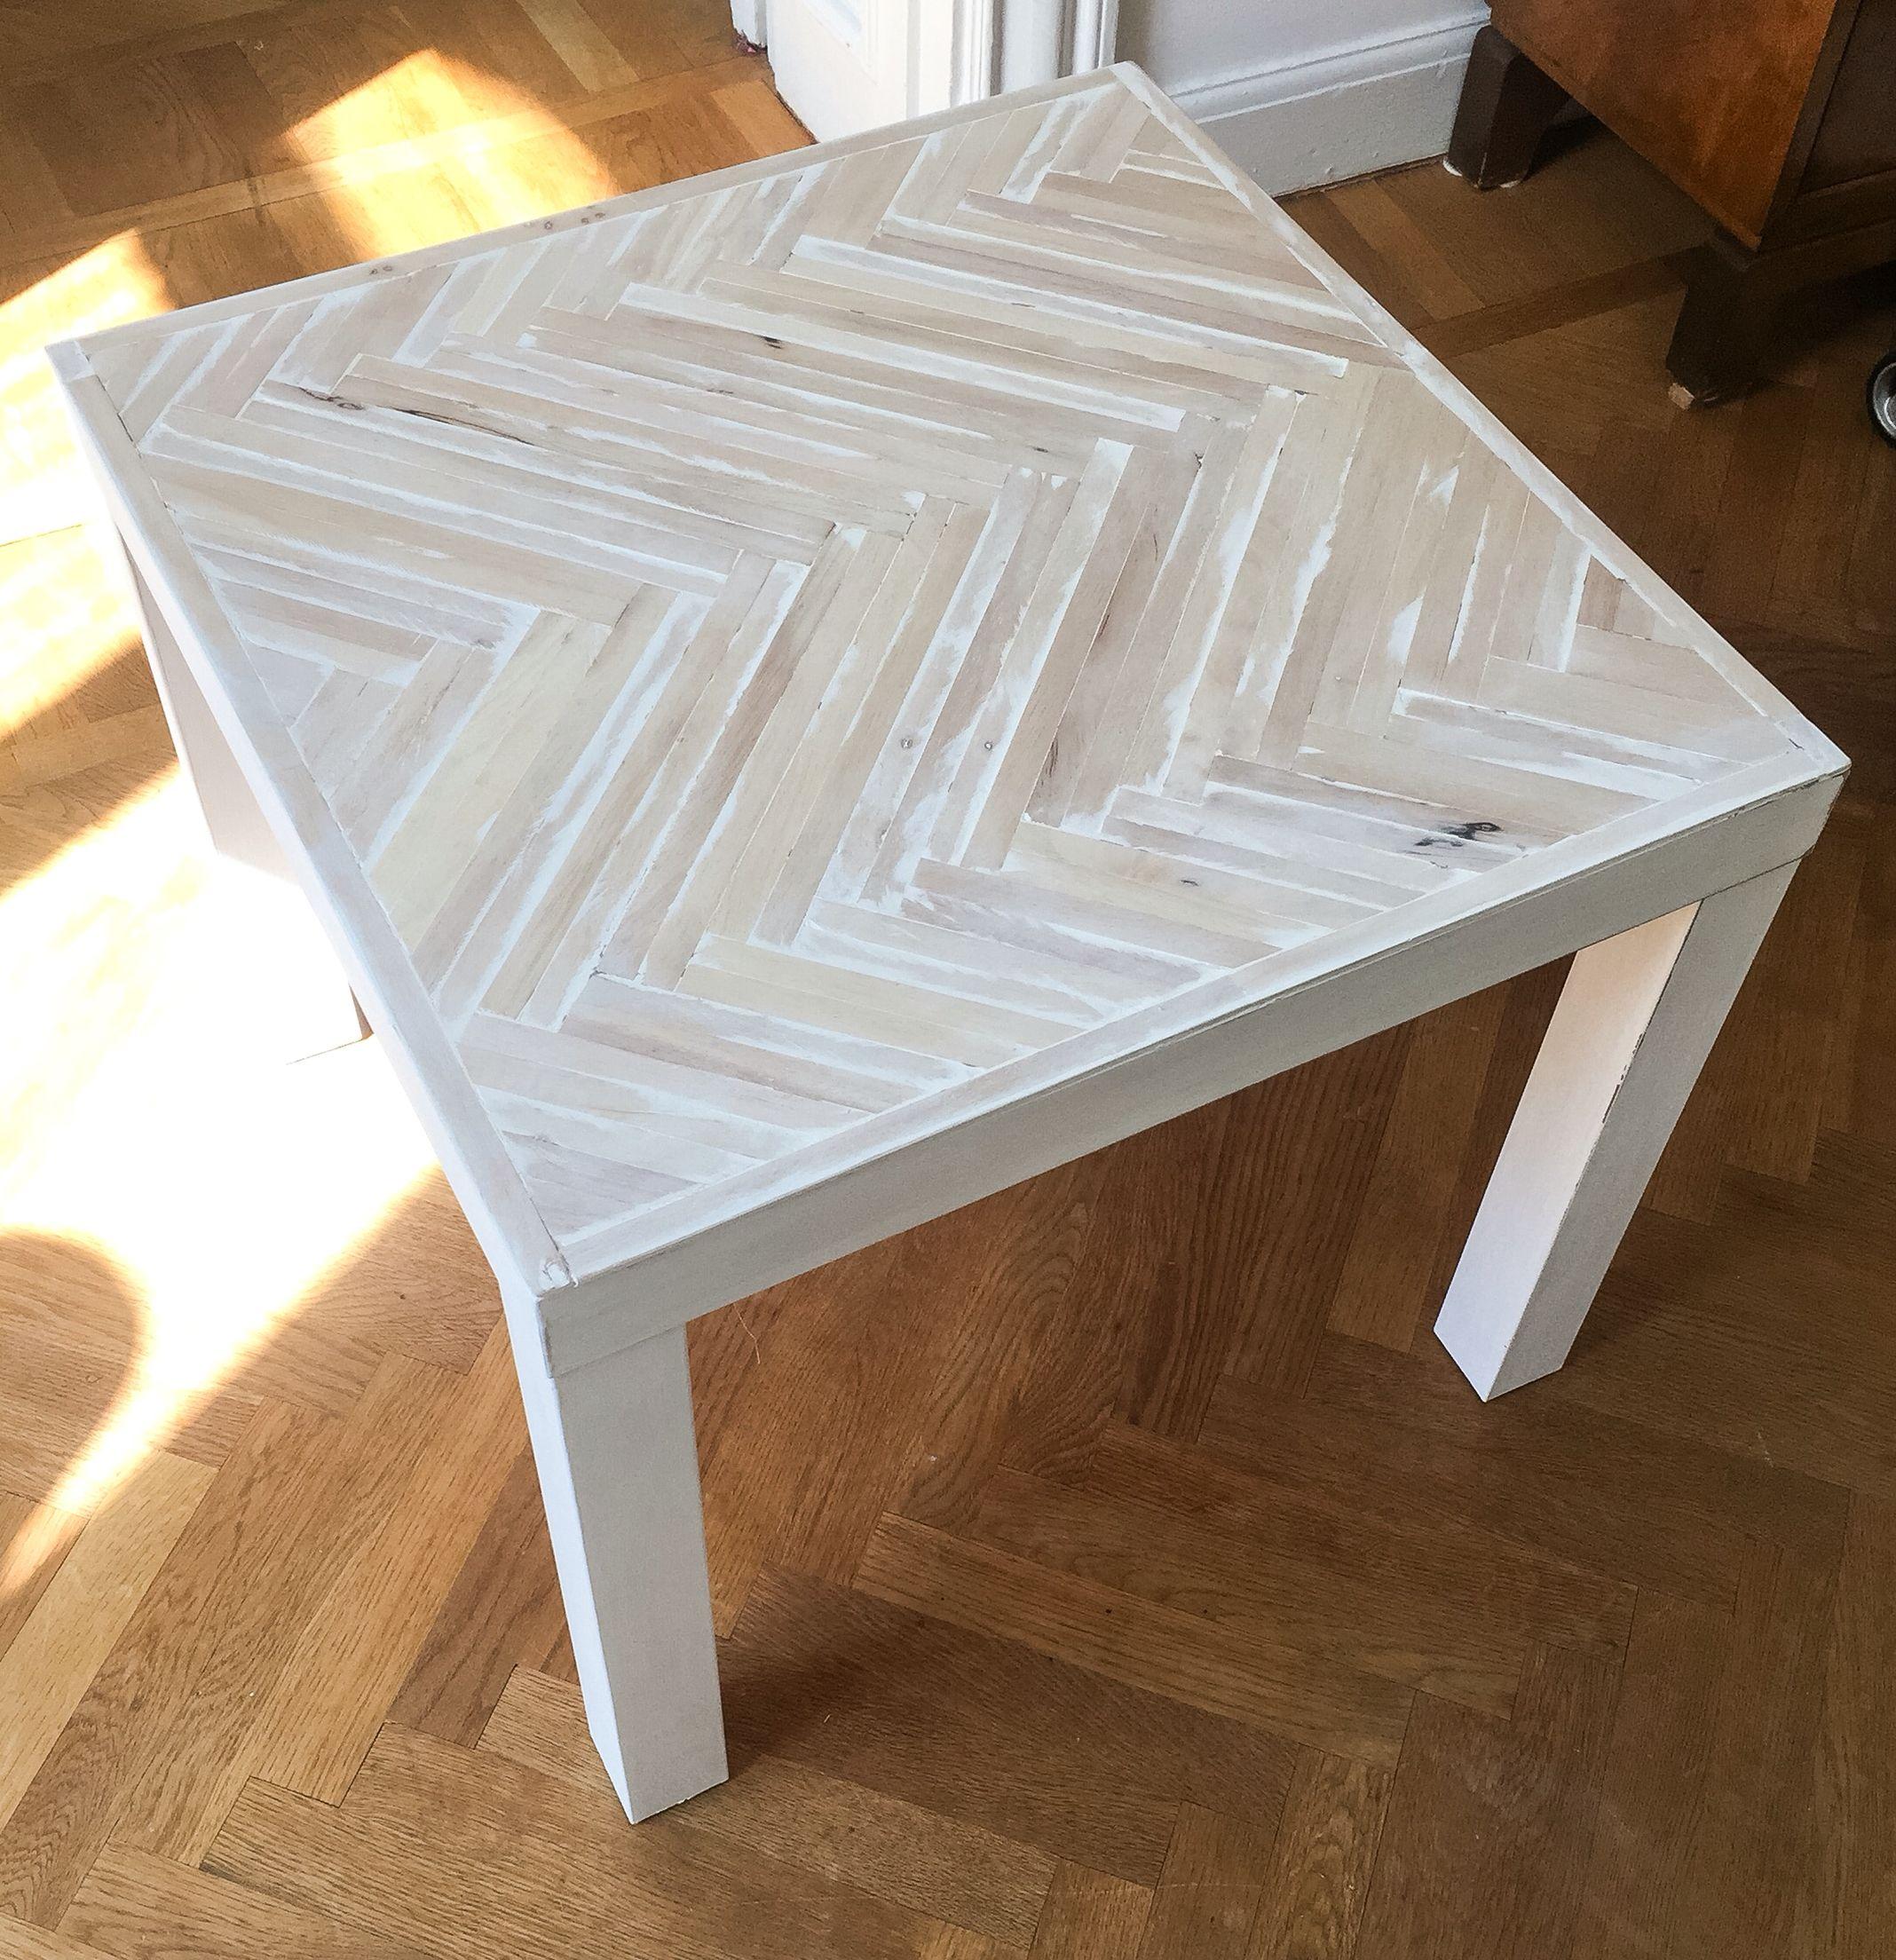 Ikea Lack Hack Fishbone Table Top Authentico Chalk Paint Ikea Fishbone Diy Ikea Lack Table Ikea Lack Diy Home Decor